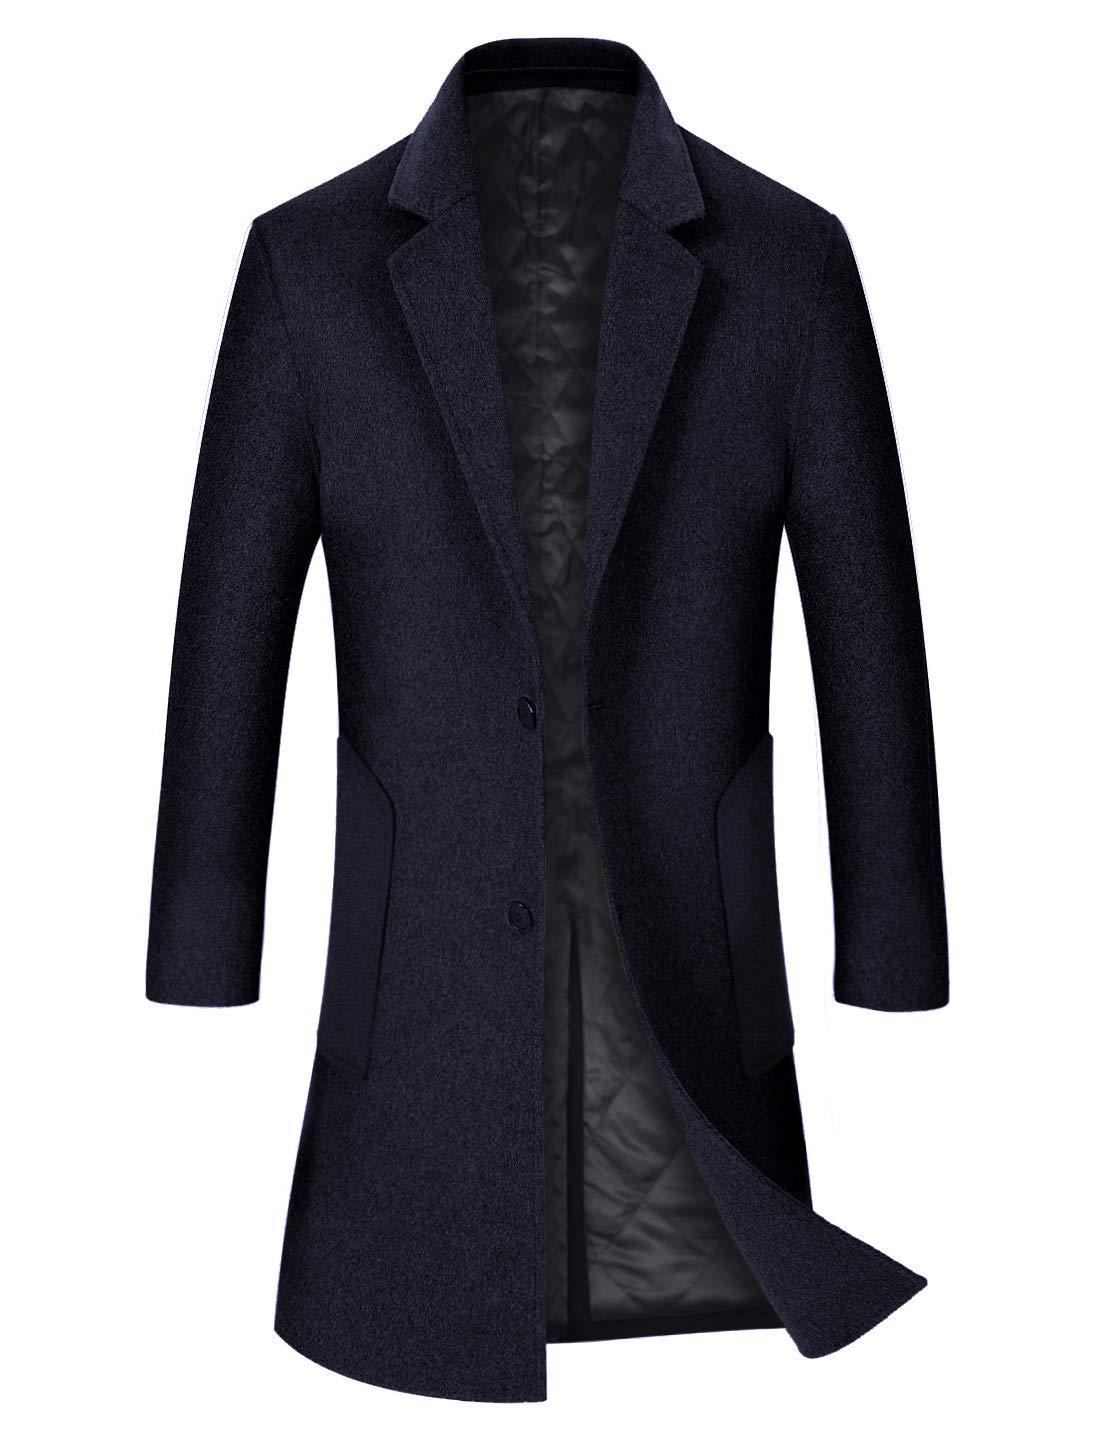 zeetoo Men's Wool Trench Coat Winter Slim Fit Wool Jacket Long Peacoat Overcoat Blue-Black Plus Cotton Small by zeetoo